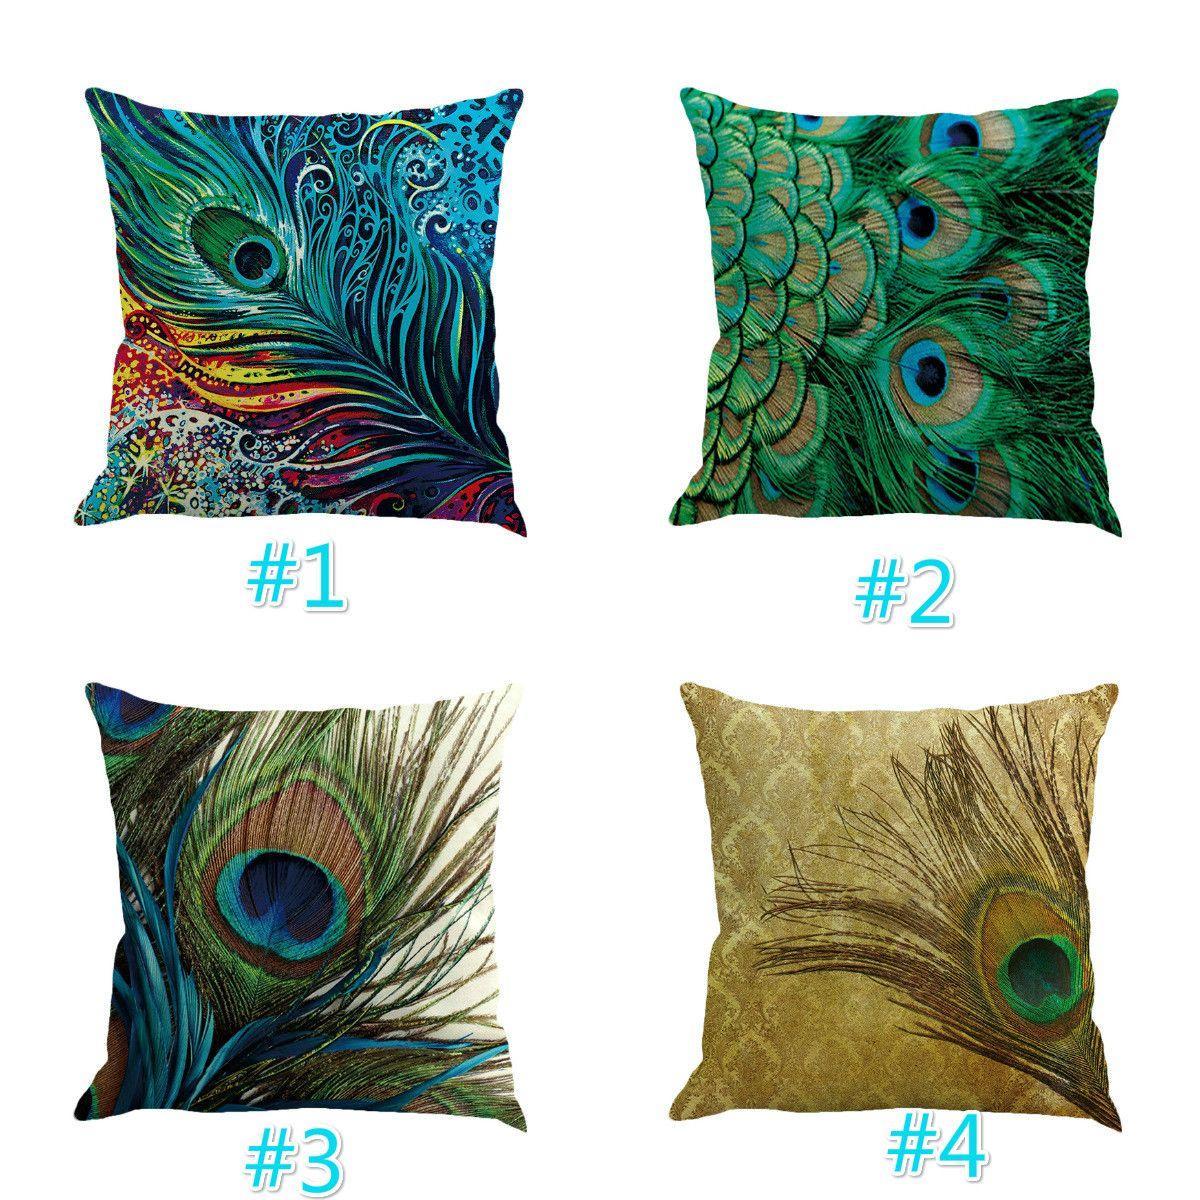 Home Textile New Creative Feather Print 45*45cm Cushion Cover Linen Throw Pillow Car Home Decoration Decorative Pillowcase